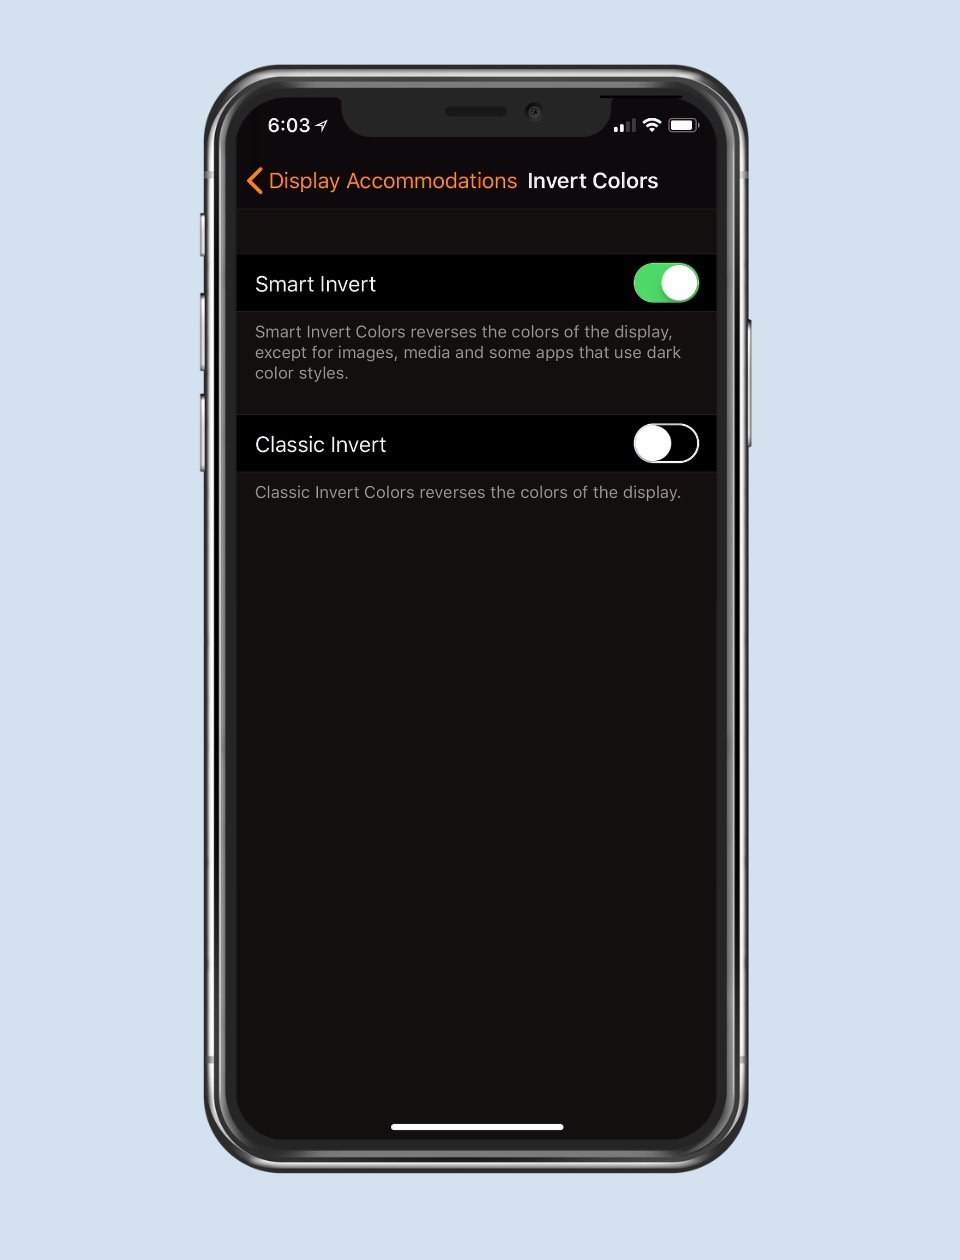 Turn on Smart Invert on iPhone